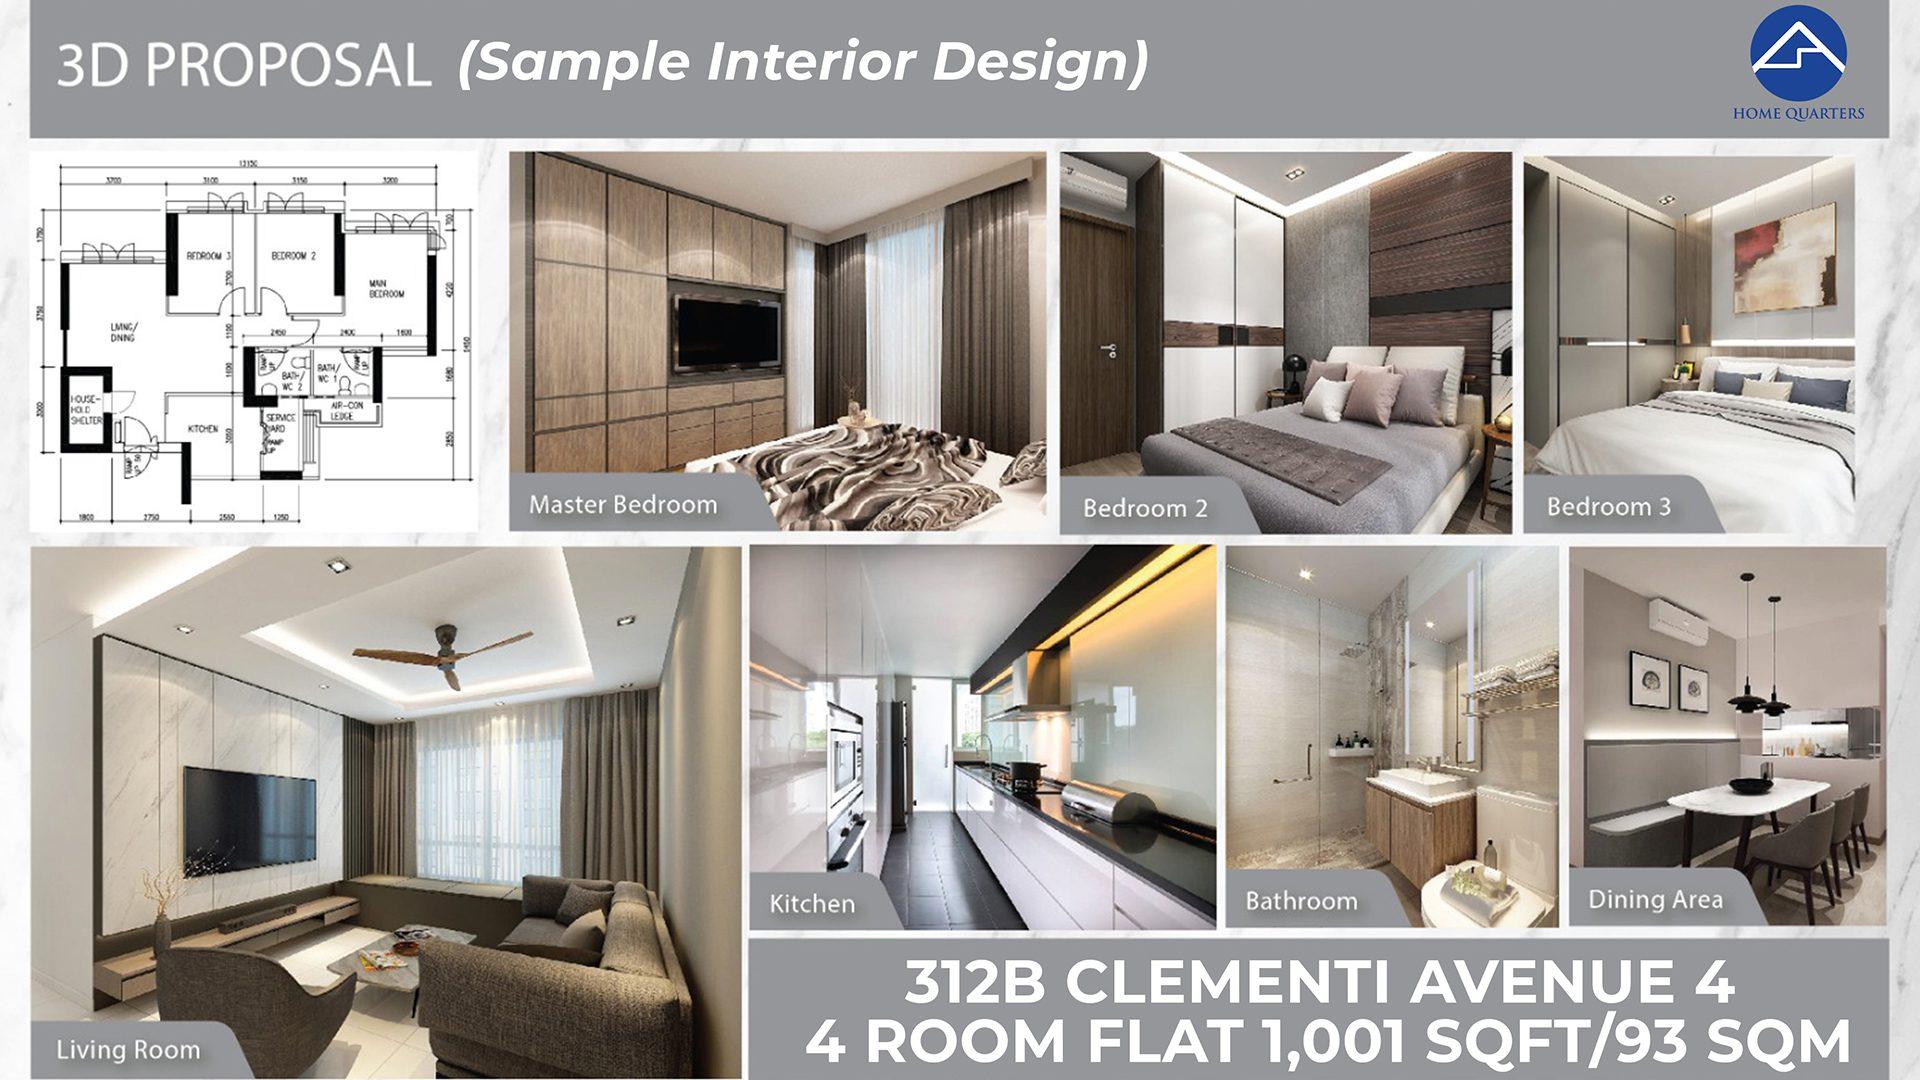 3D Proposal_312B Clementi Ave 4_1920x1080_Home Quarters SG_KC Ng Keng Chong